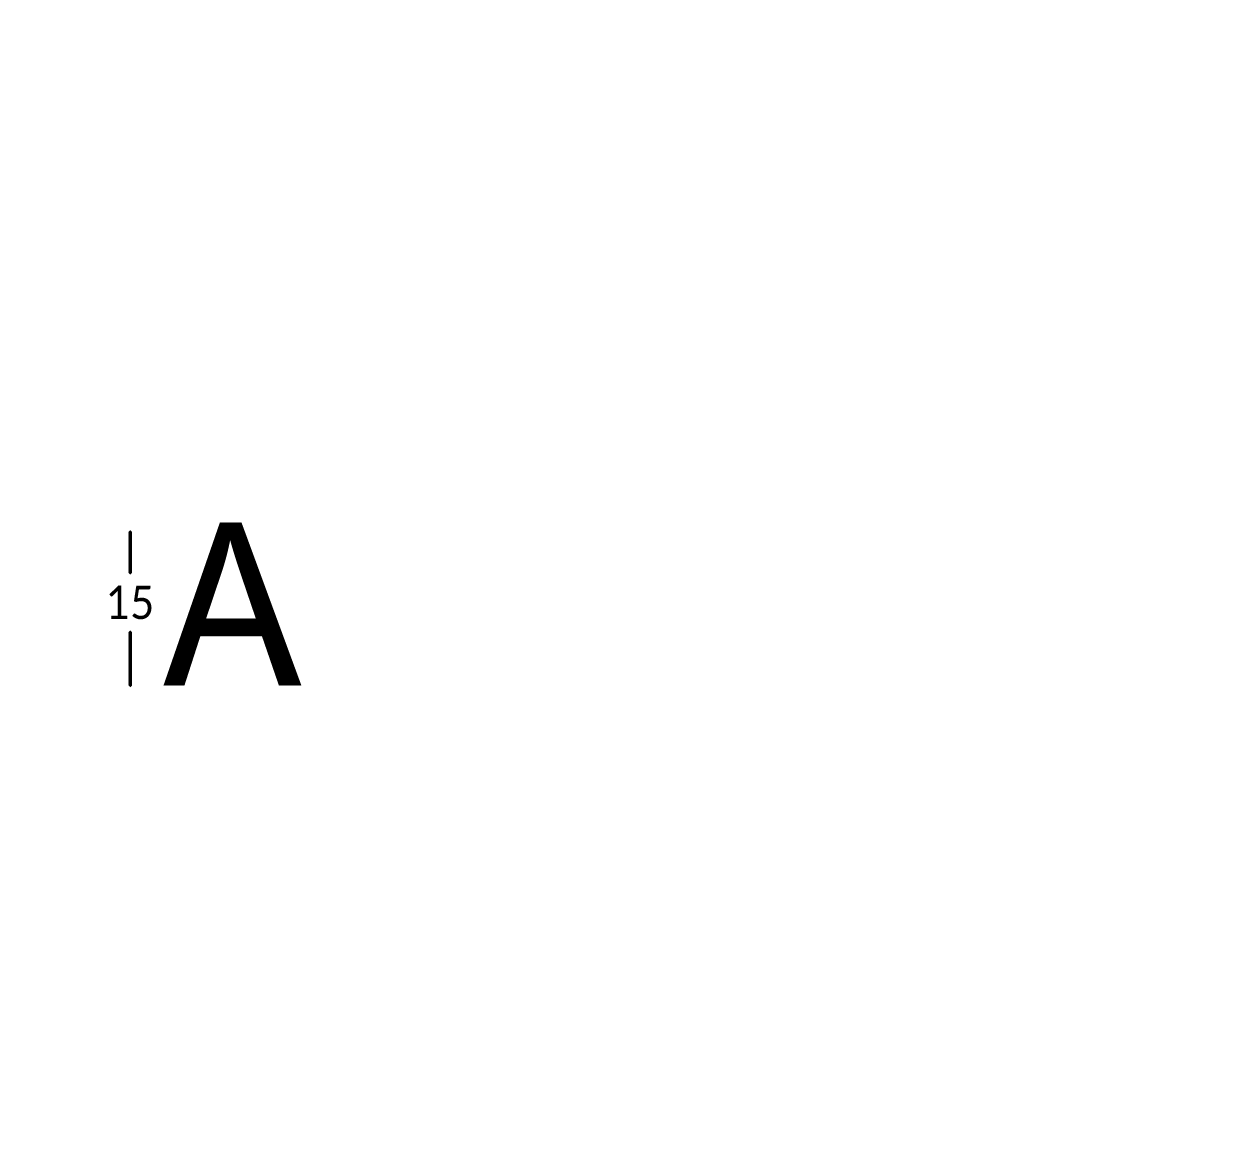 Carattere rit. h15cm/s2.5mm